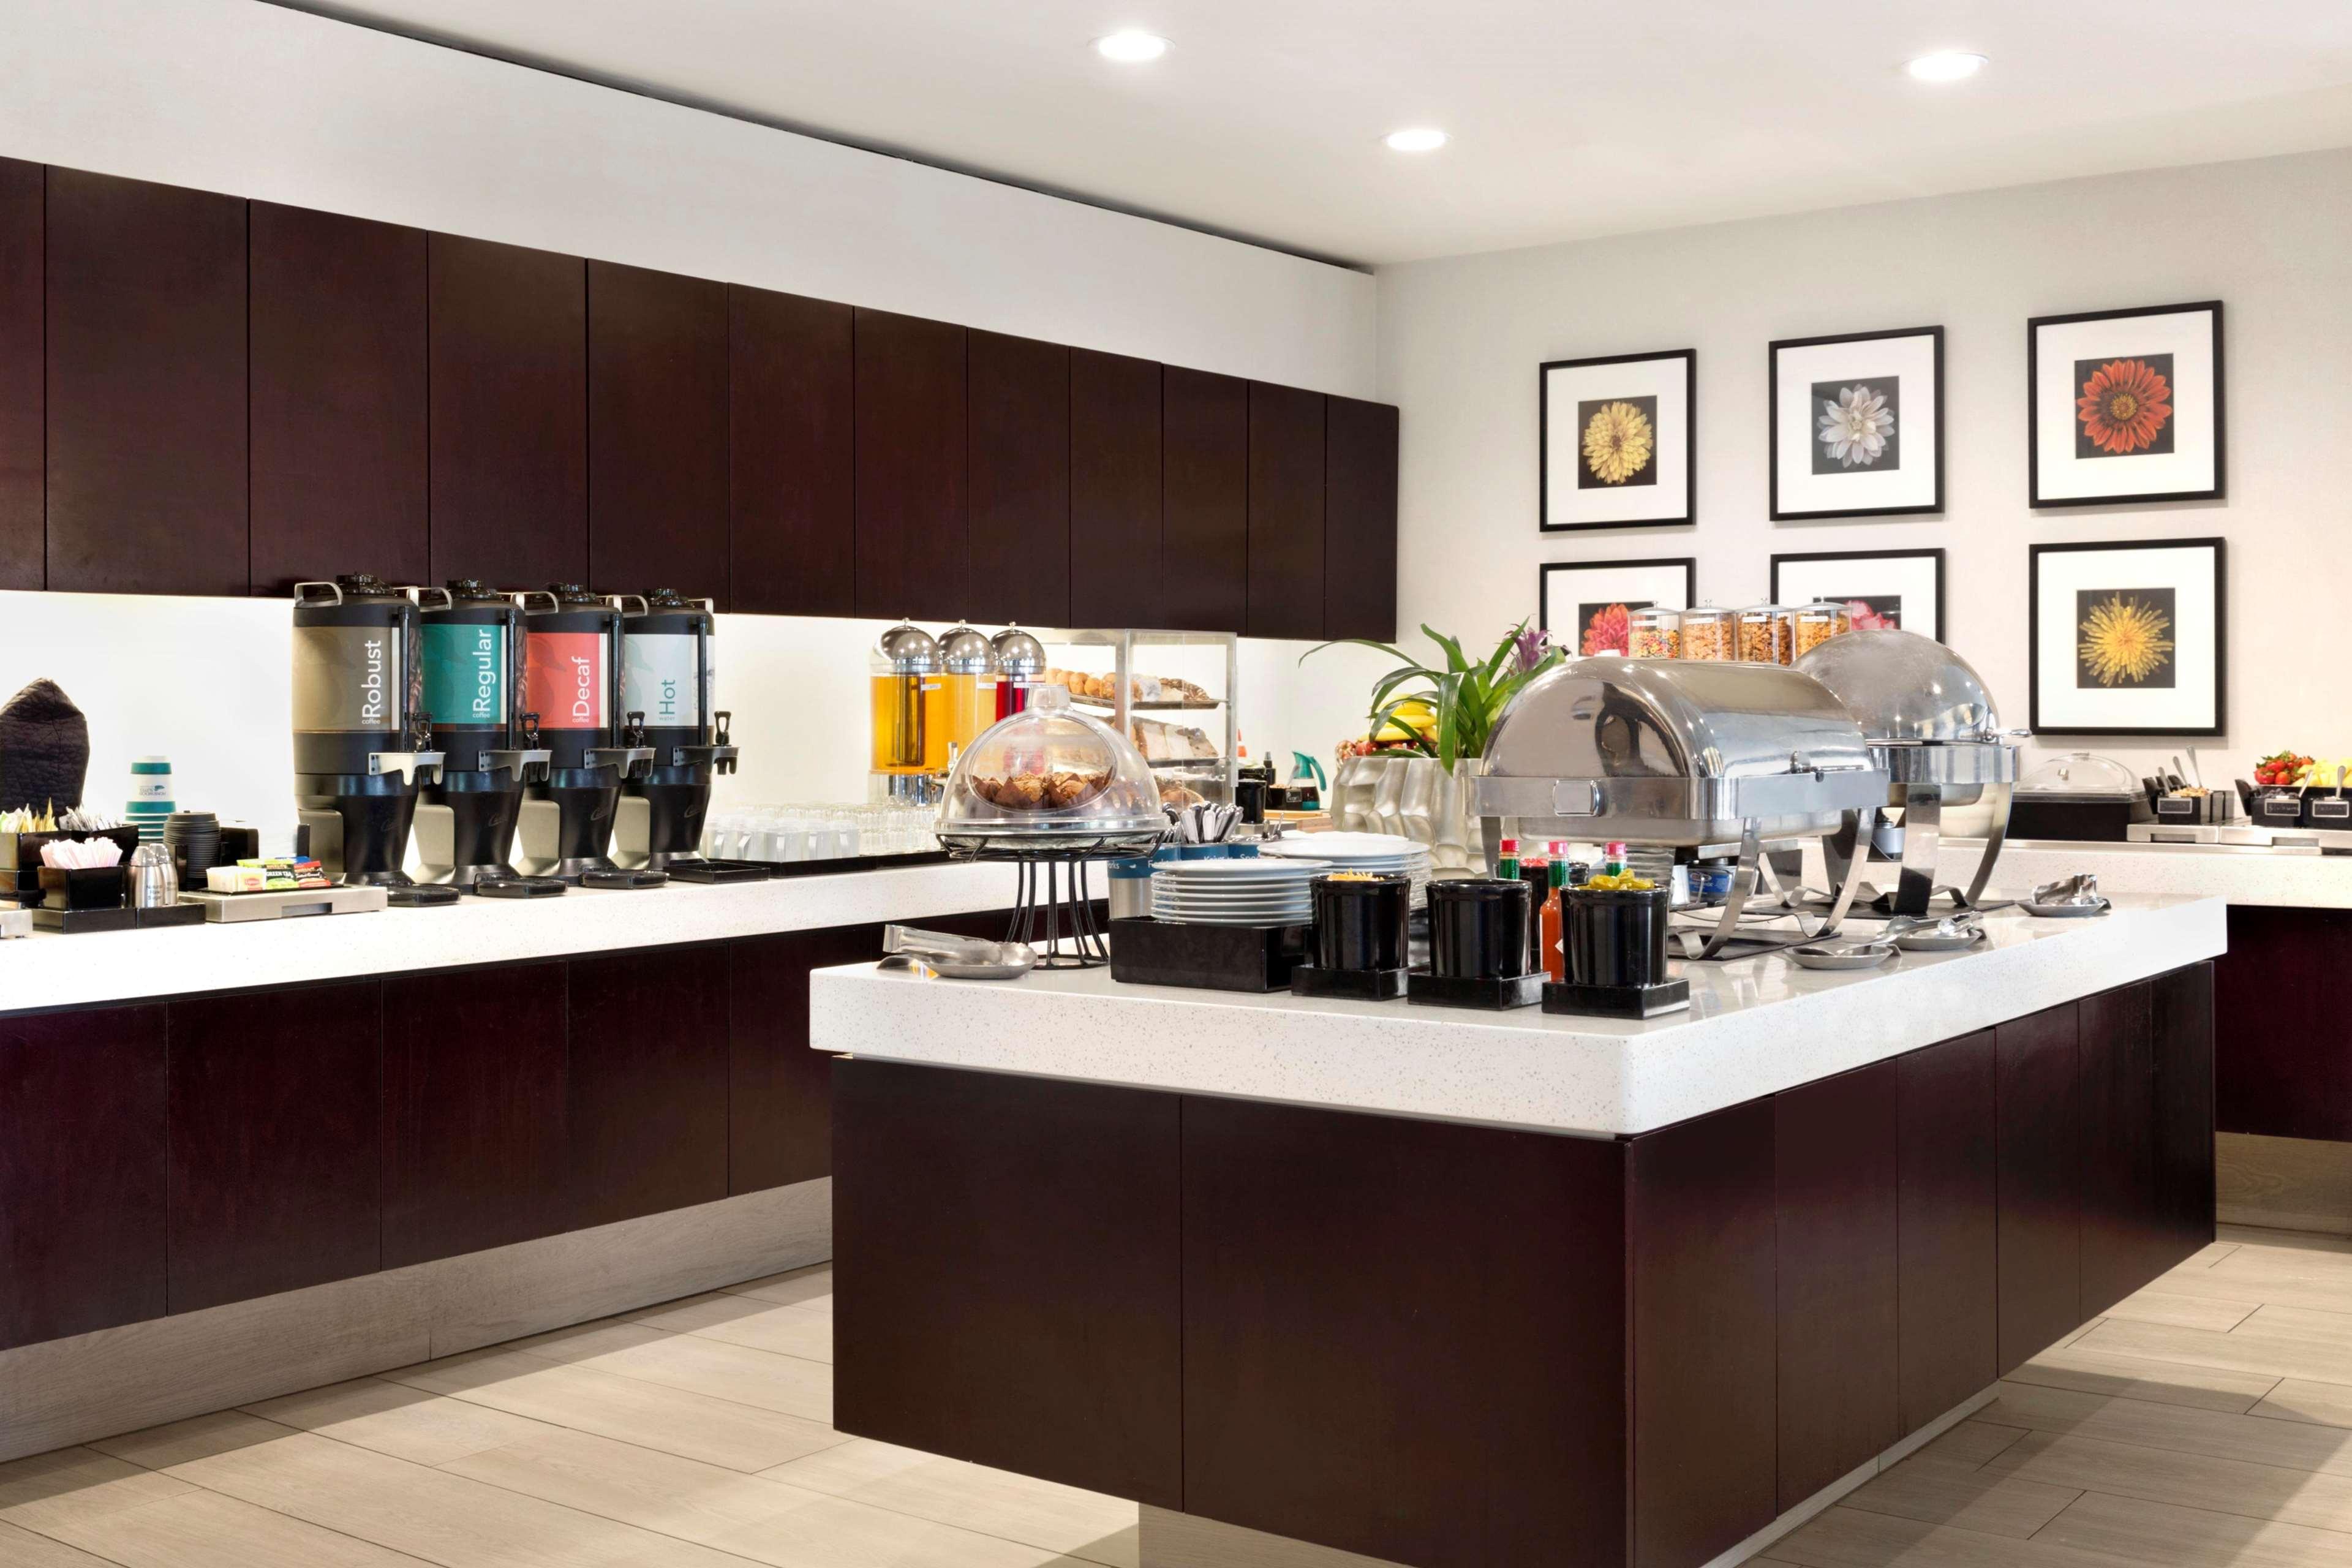 Homewood Suites by Hilton Plano-Richardson image 25